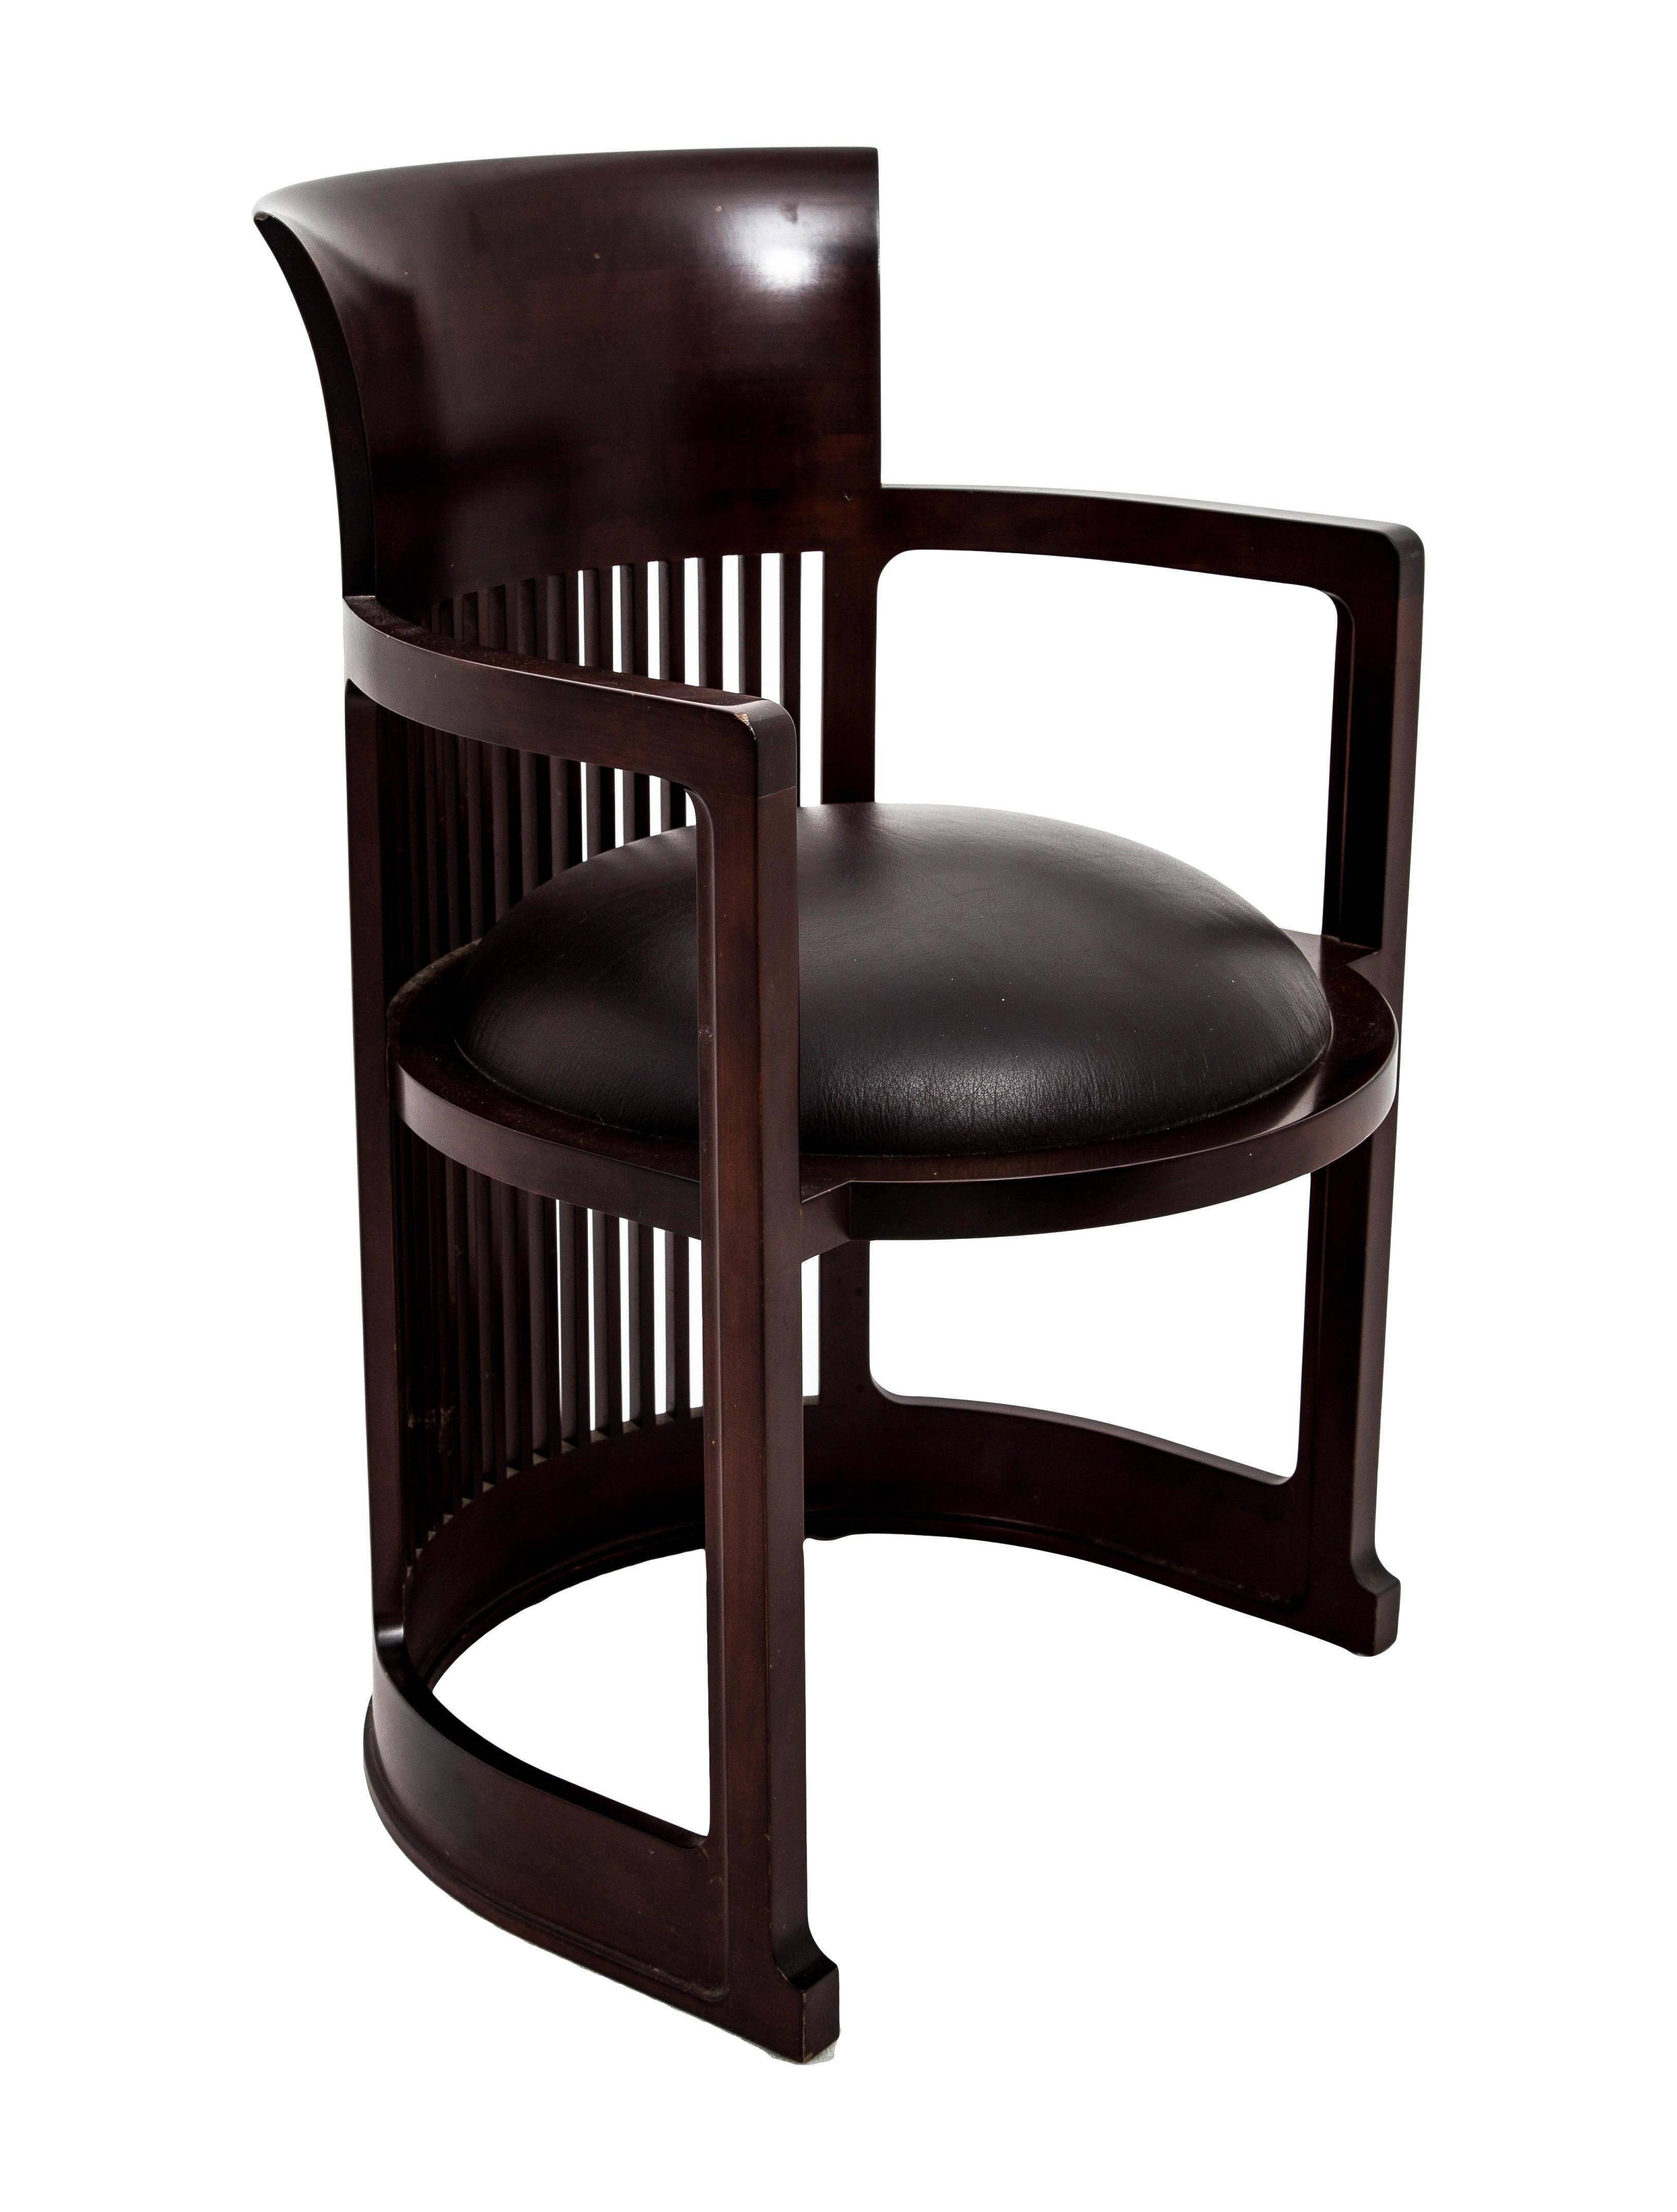 Cassina frank lloyd wright barrel chair furniture for Sedia barrel wright